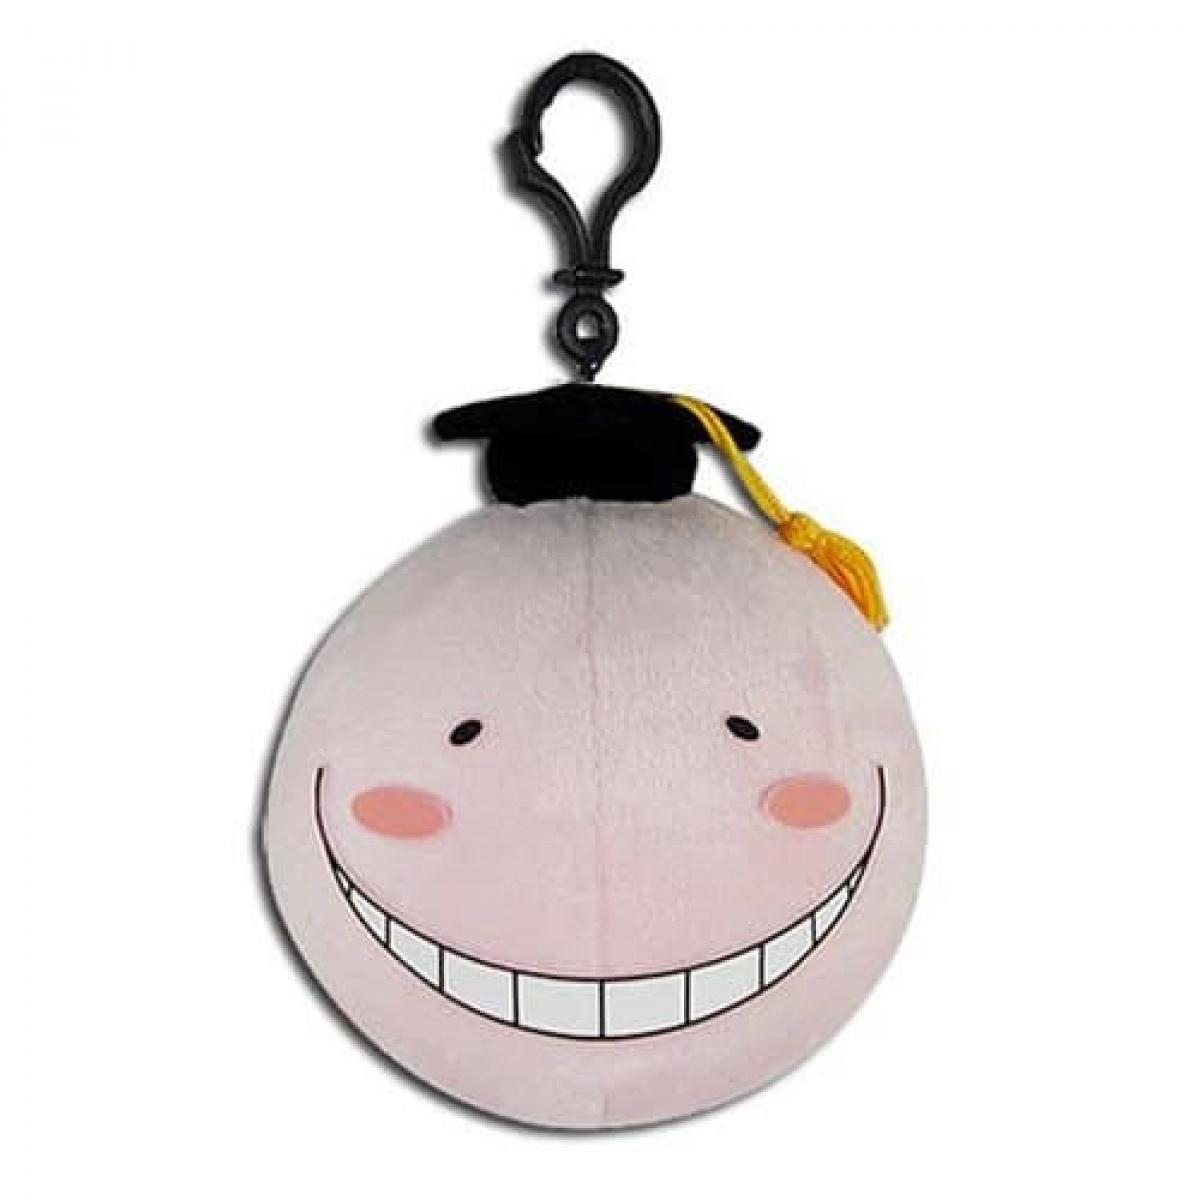 Assassination Classroom Pink Koro Sensei 4″ Plush Keychain Anime Plushies 4